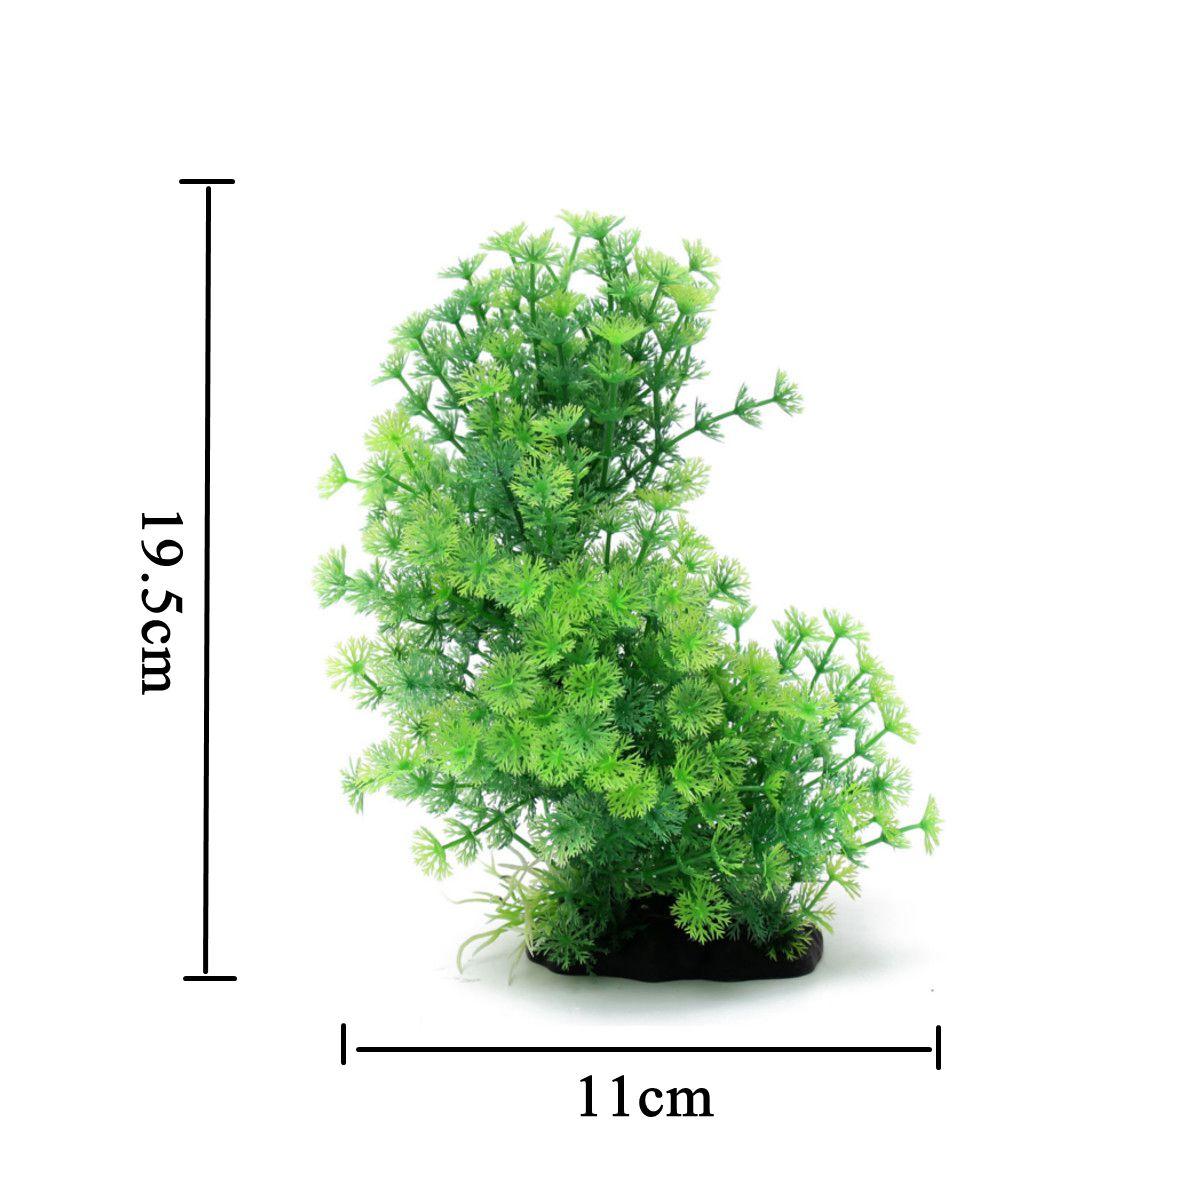 20 Type Artificial Plastic Water Plants Landscape For Aquarium Fish Tank Decor Ebay